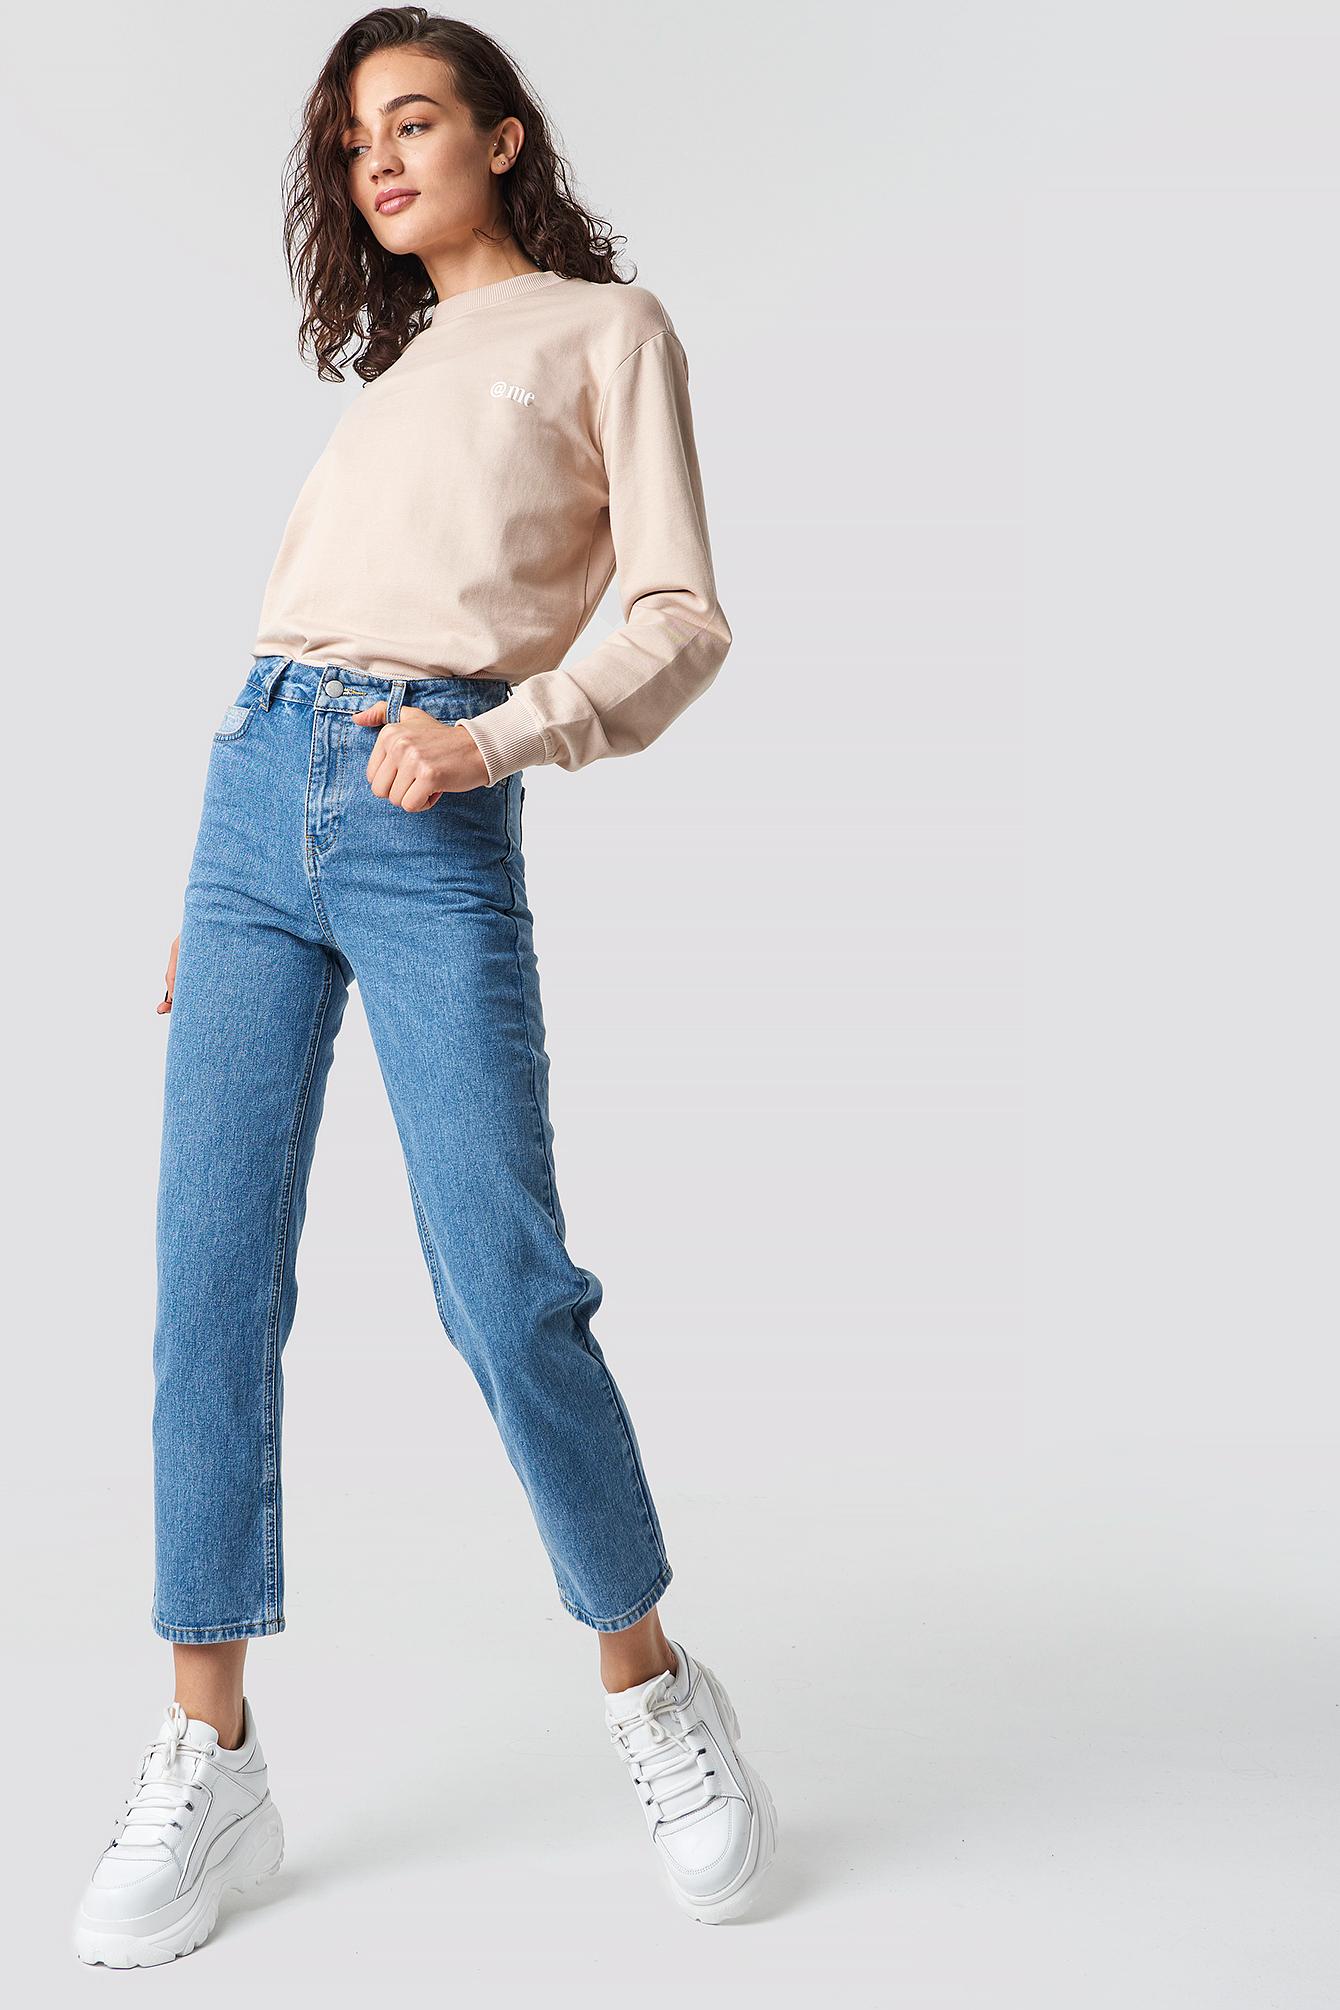 ASTRID OLSEN X NA-KD Straight Leg Jeans - Blue